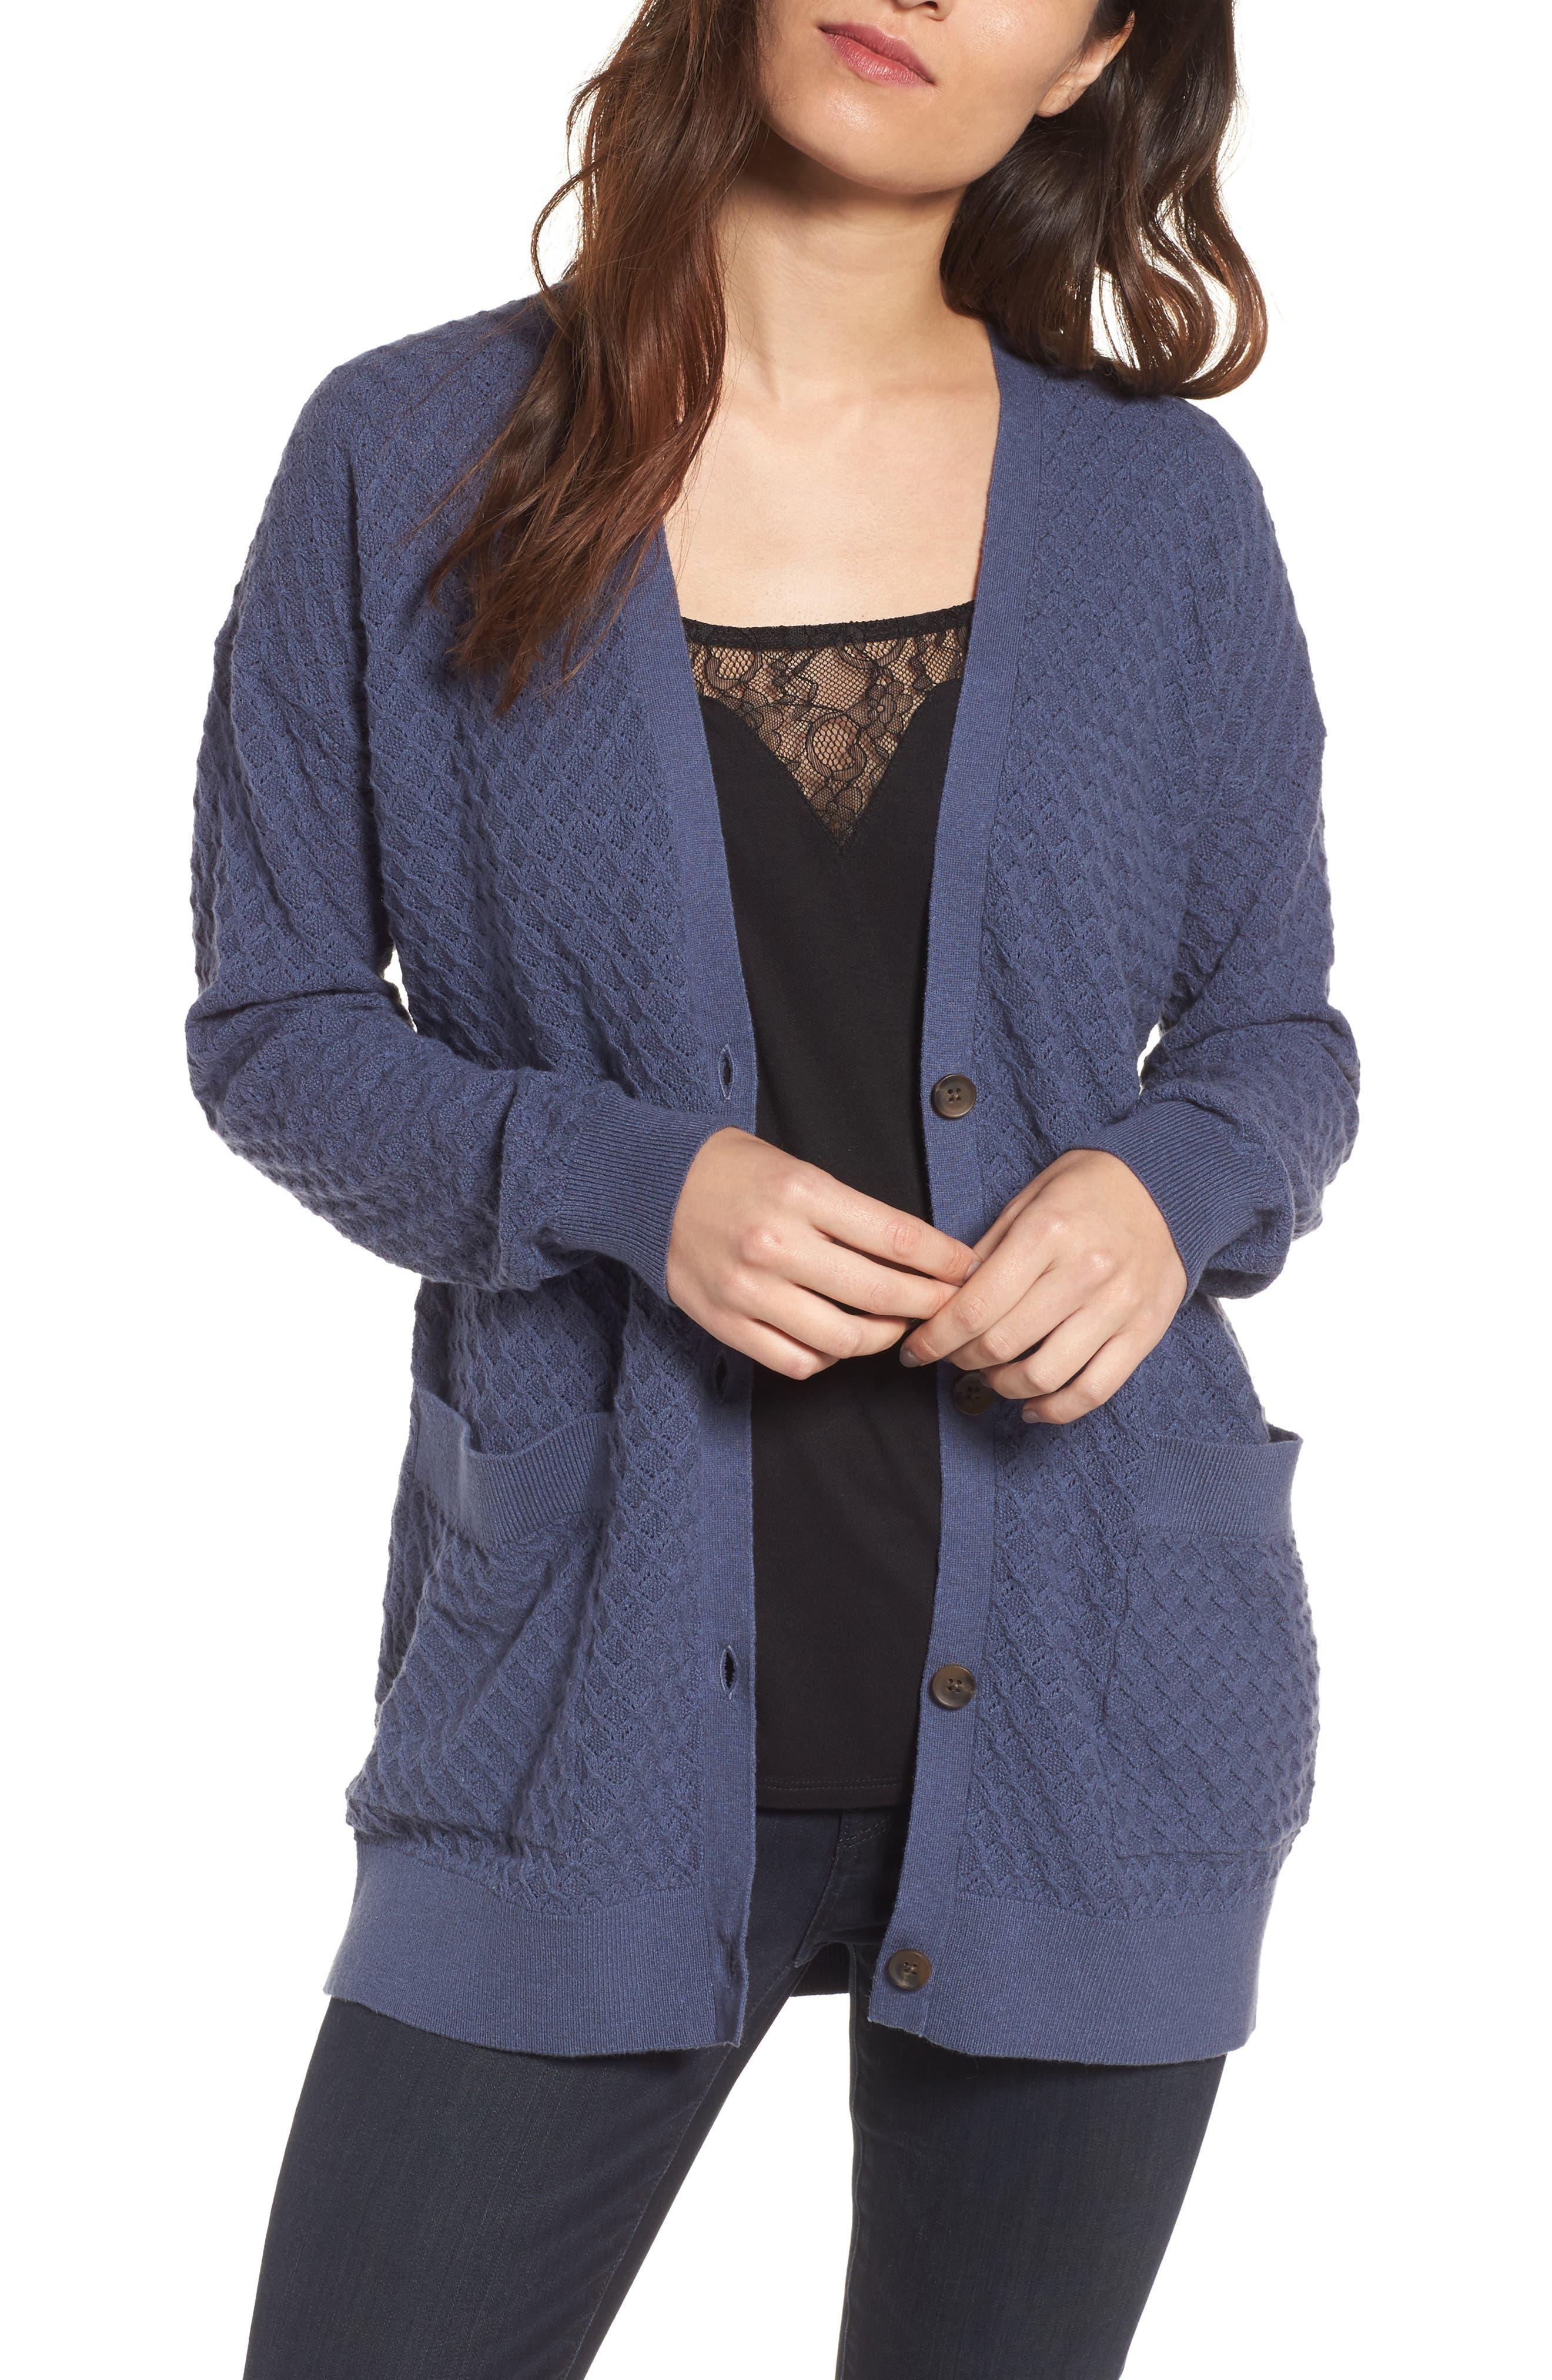 Pointelle Cardigan Sweater,                             Main thumbnail 1, color,                             Blue Vintage